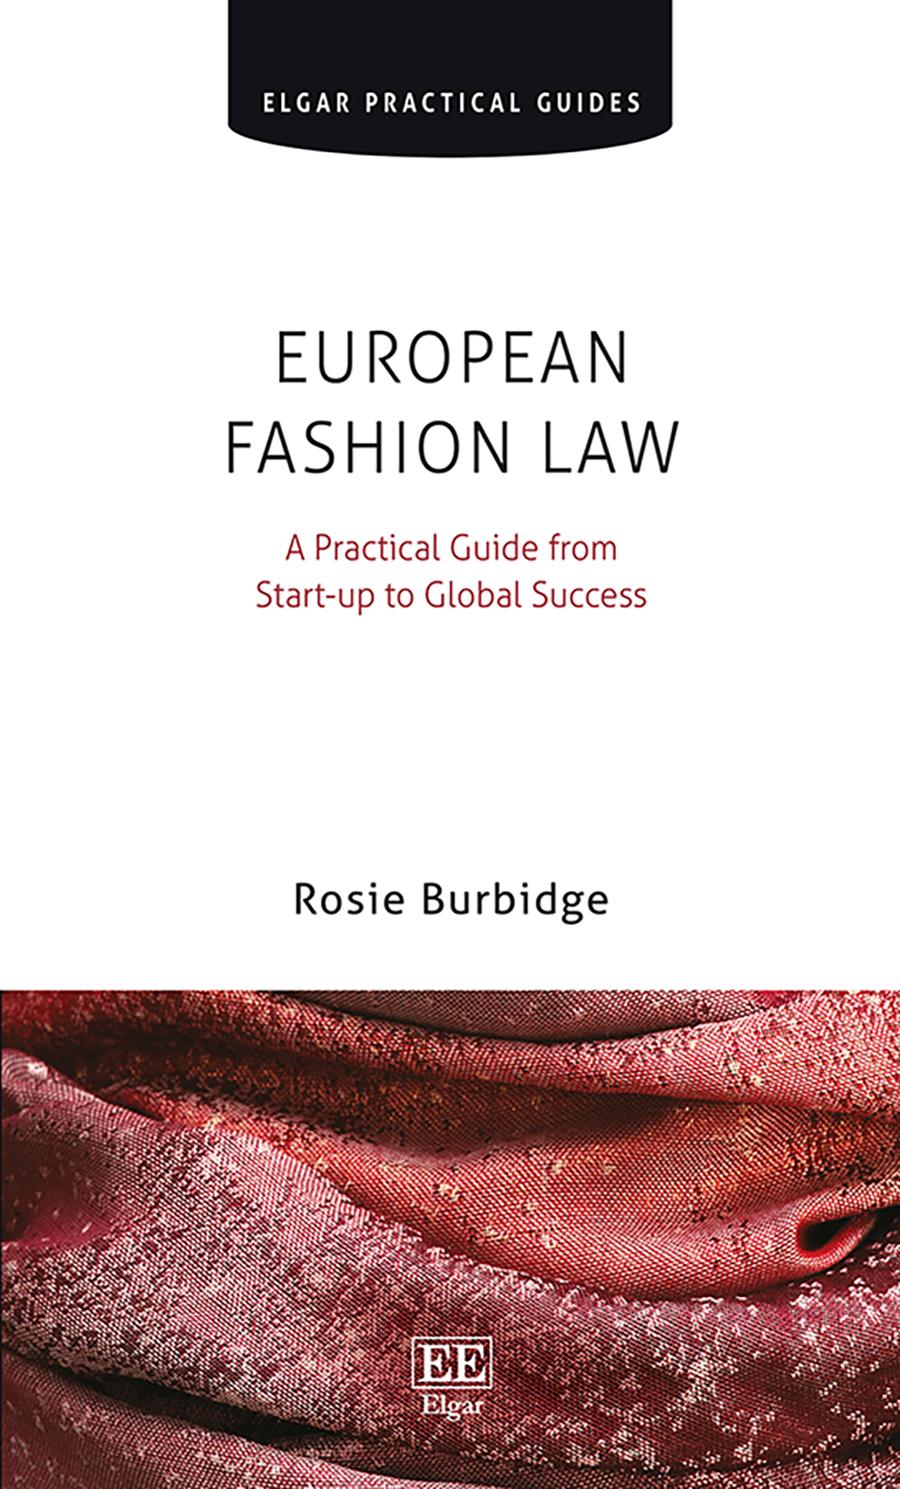 Download Ebook European Fashion Law by Rosie Burbidge Pdf